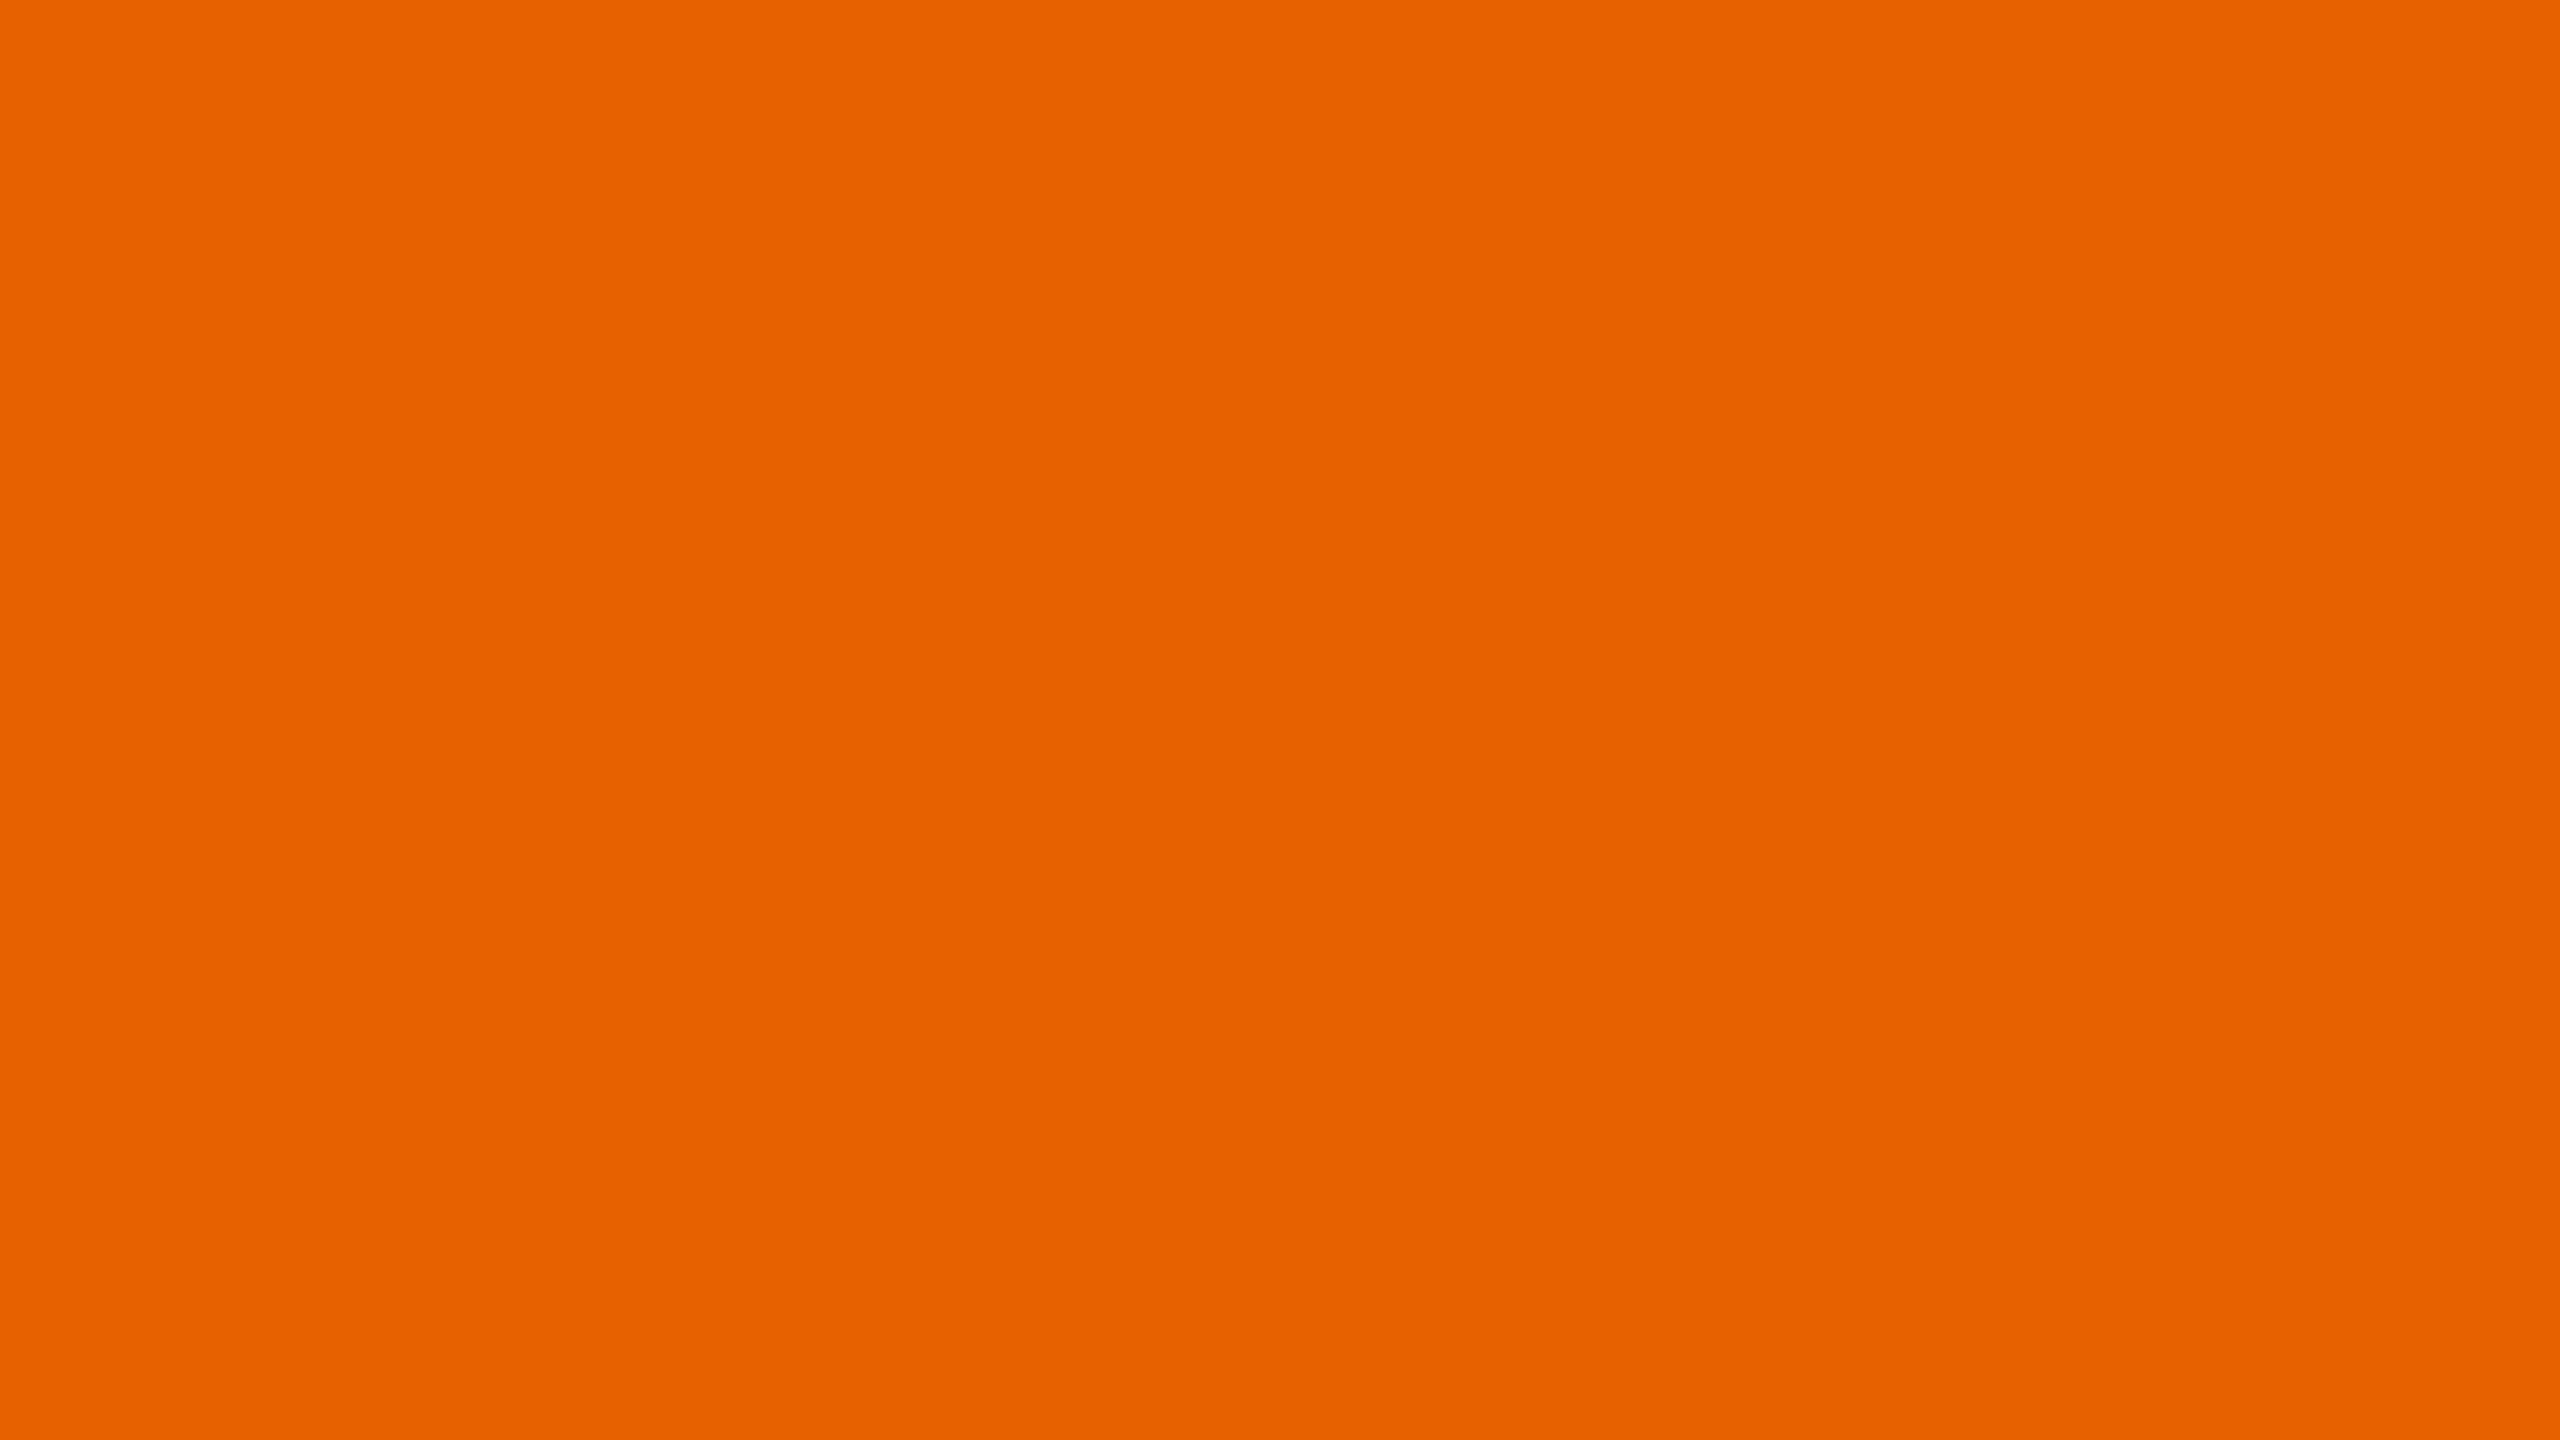 2560x1440 Spanish Orange Solid Color Background